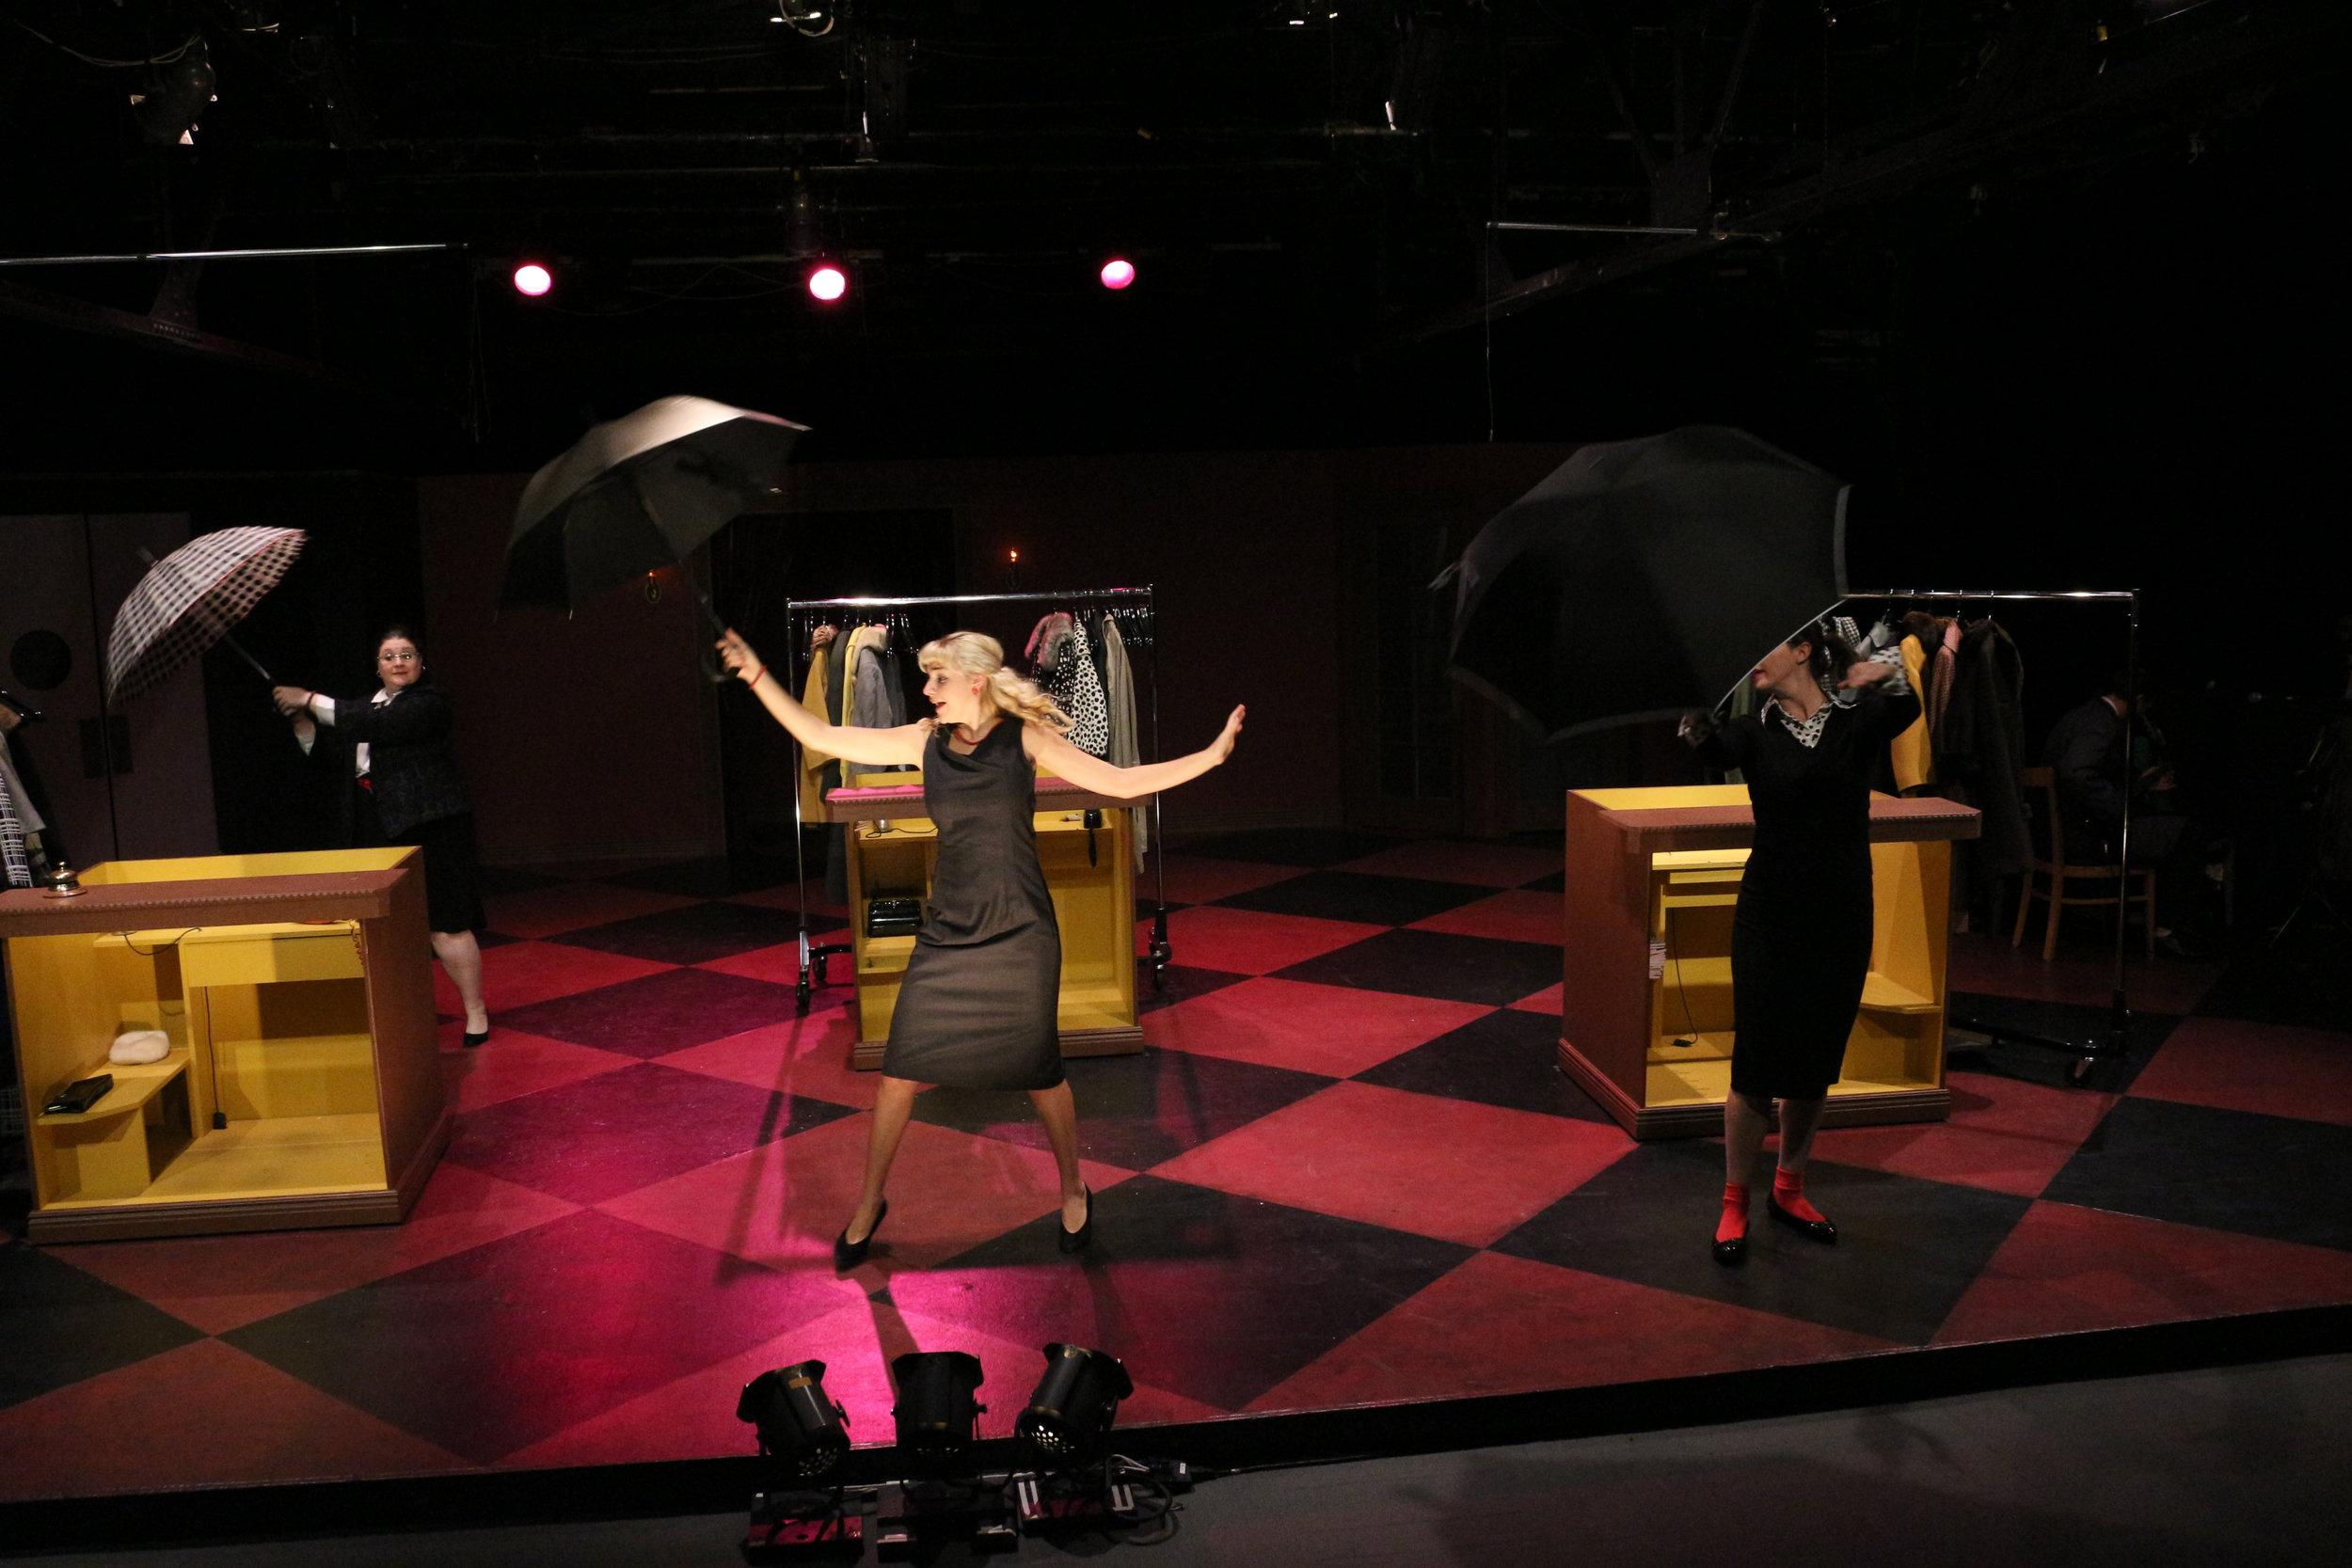 Gayle Ottmar, Charlotte Calvert & Anna Hickey, Red Eye Theater, 2014; photo by Liz Josheff